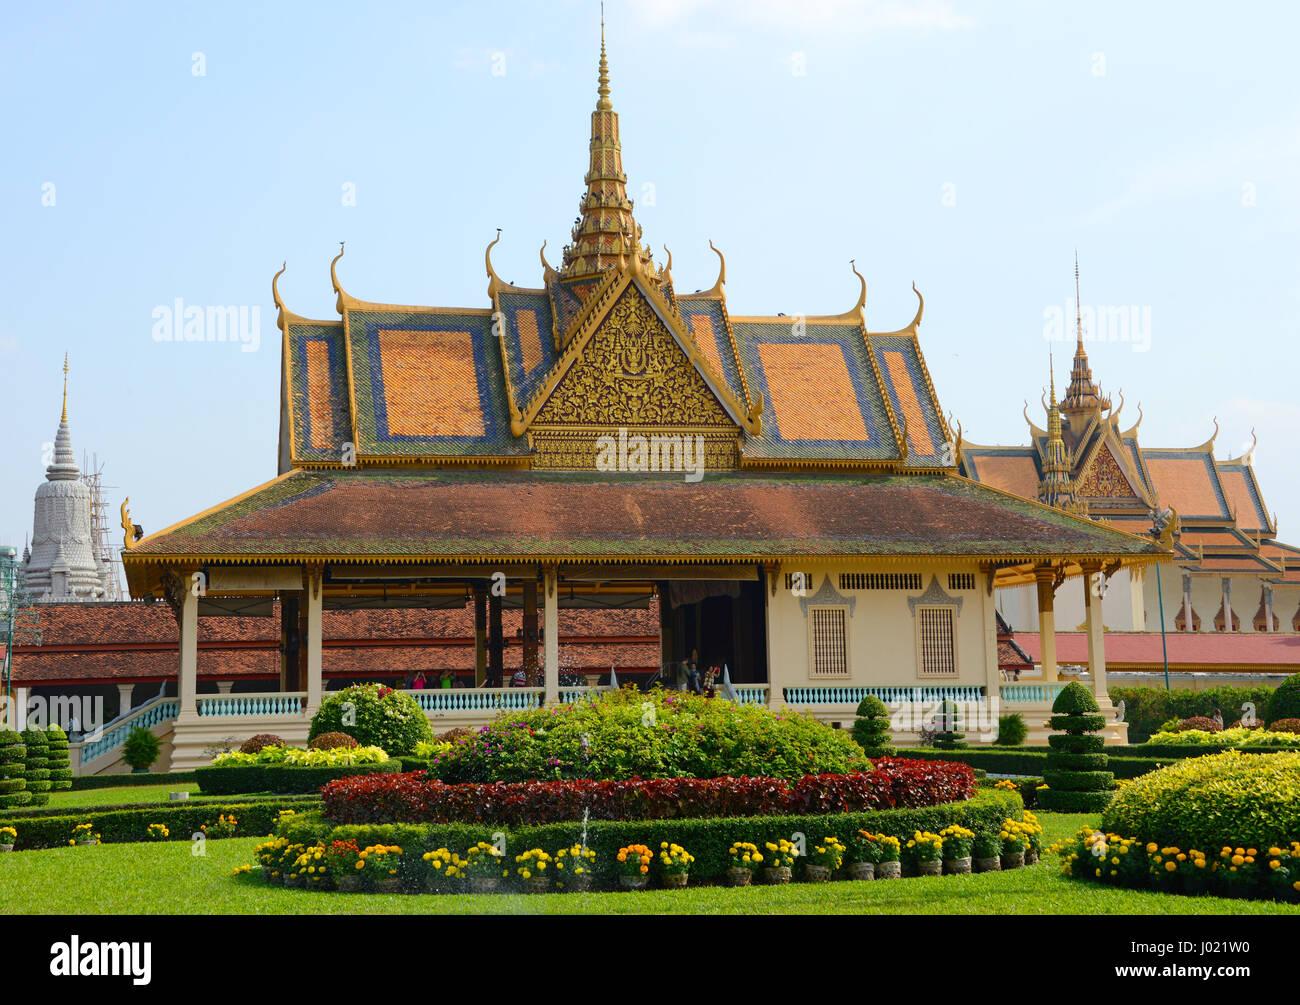 Royal Palace of Cambodia, Phnom Penh - Stock Image